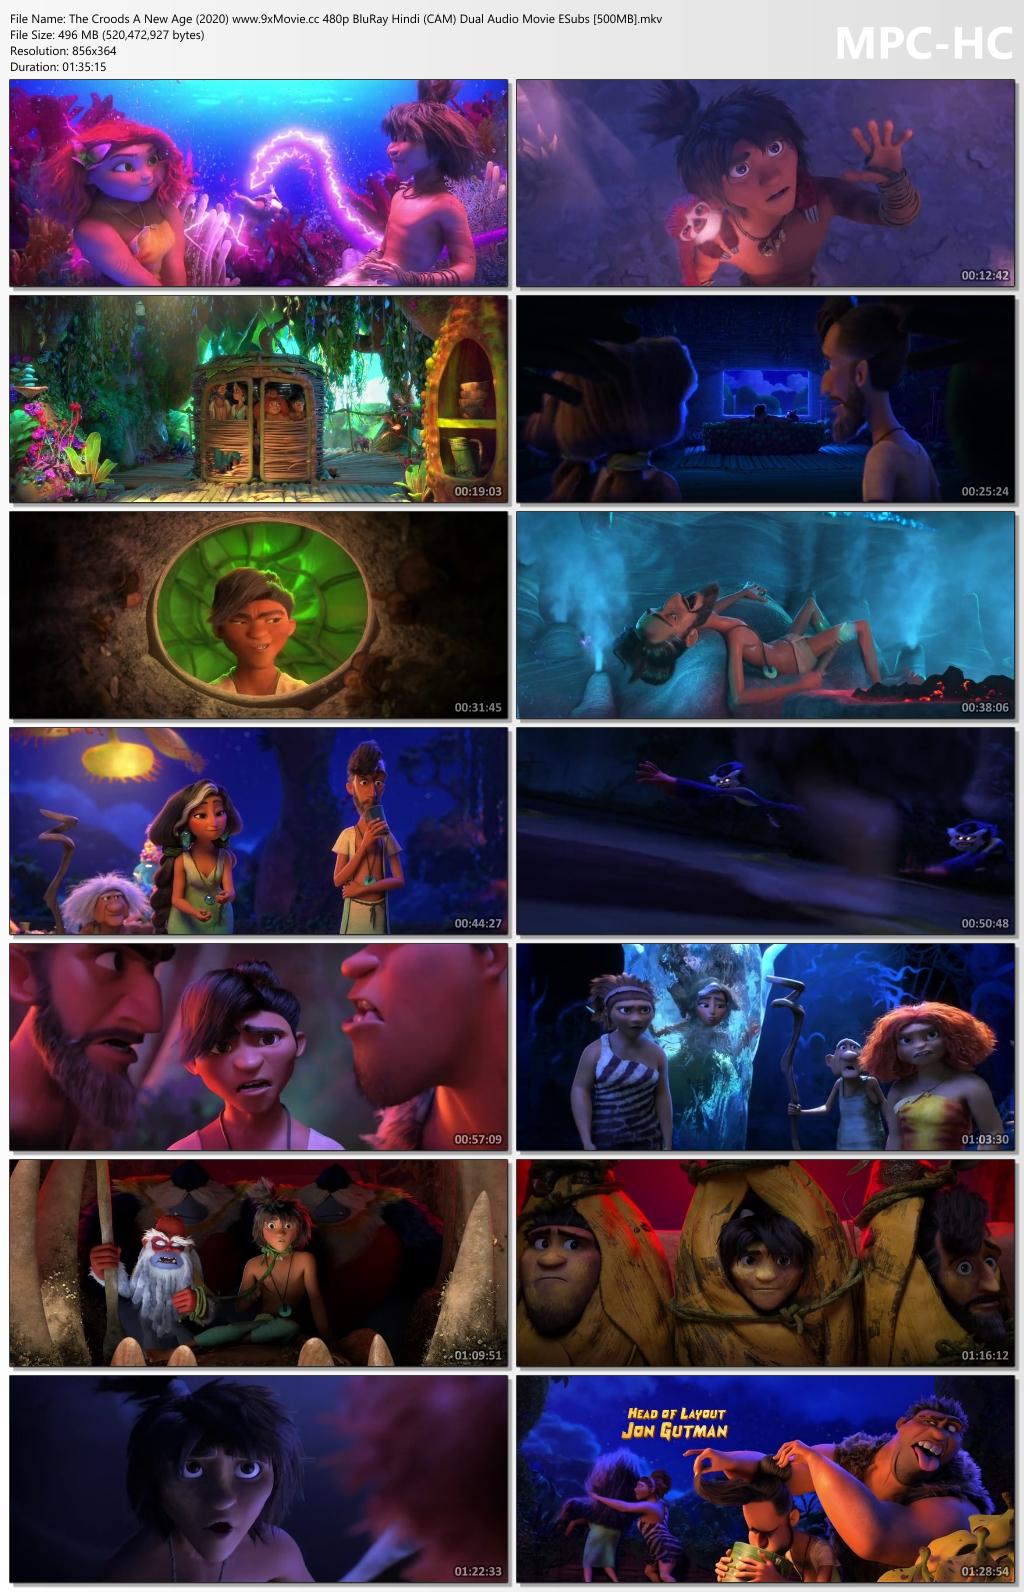 The-Croods-A-New-Age-2020-www-9x-Movie-cc-480p-Blu-Ray-Hindi-CAM-Dual-Audio-Movie-ESubs-500-MB-mkv